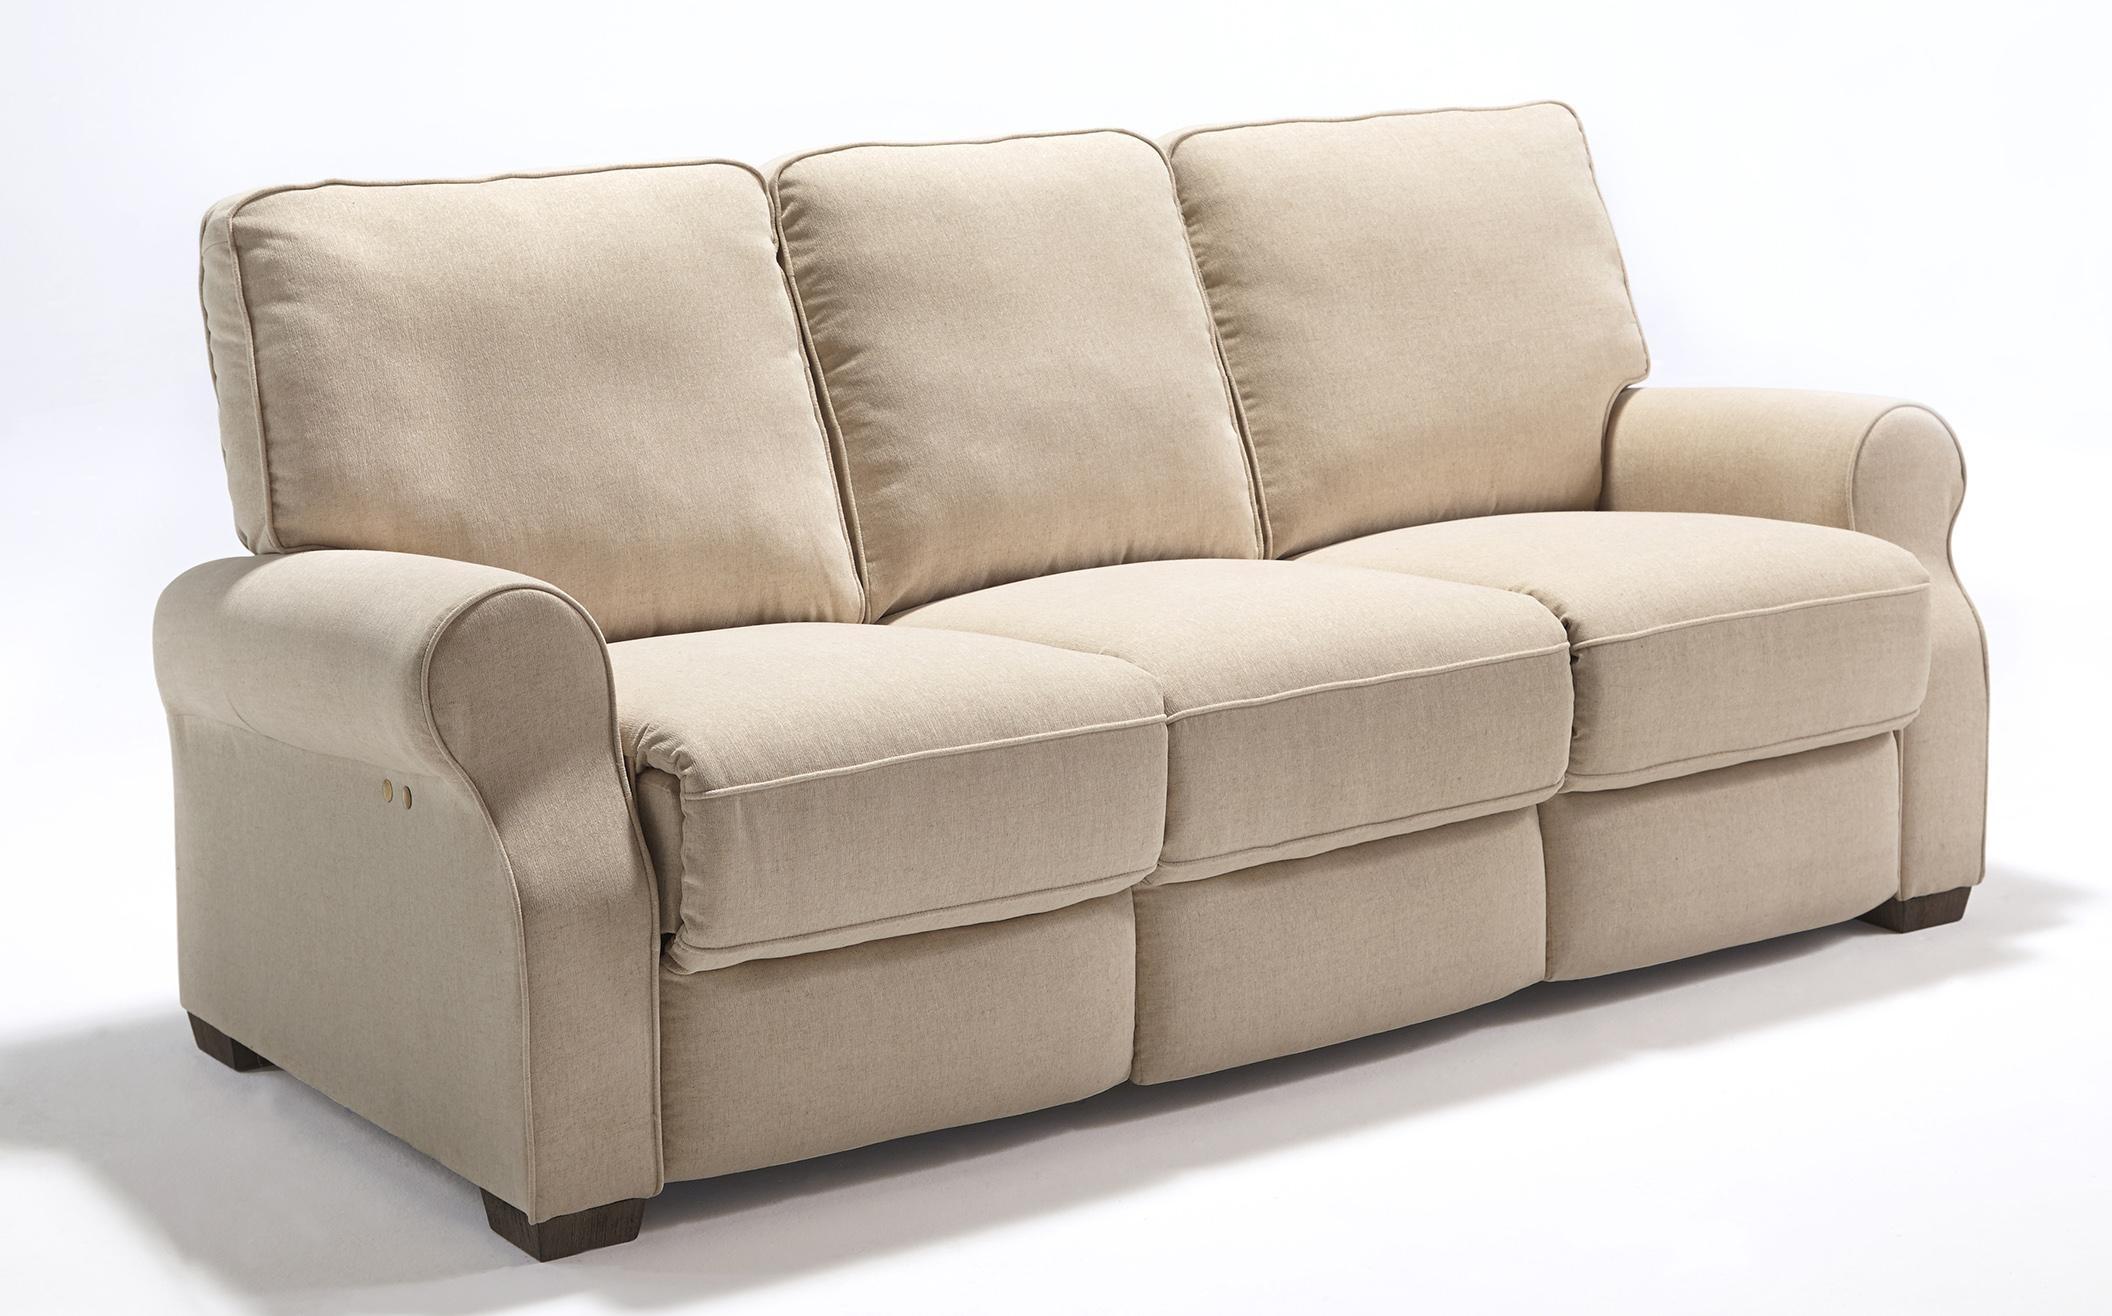 Brilliant Recliner Sofas On Furniture Power Recliner Sofa With Regard To Recliner Sofas (View 2 of 10)